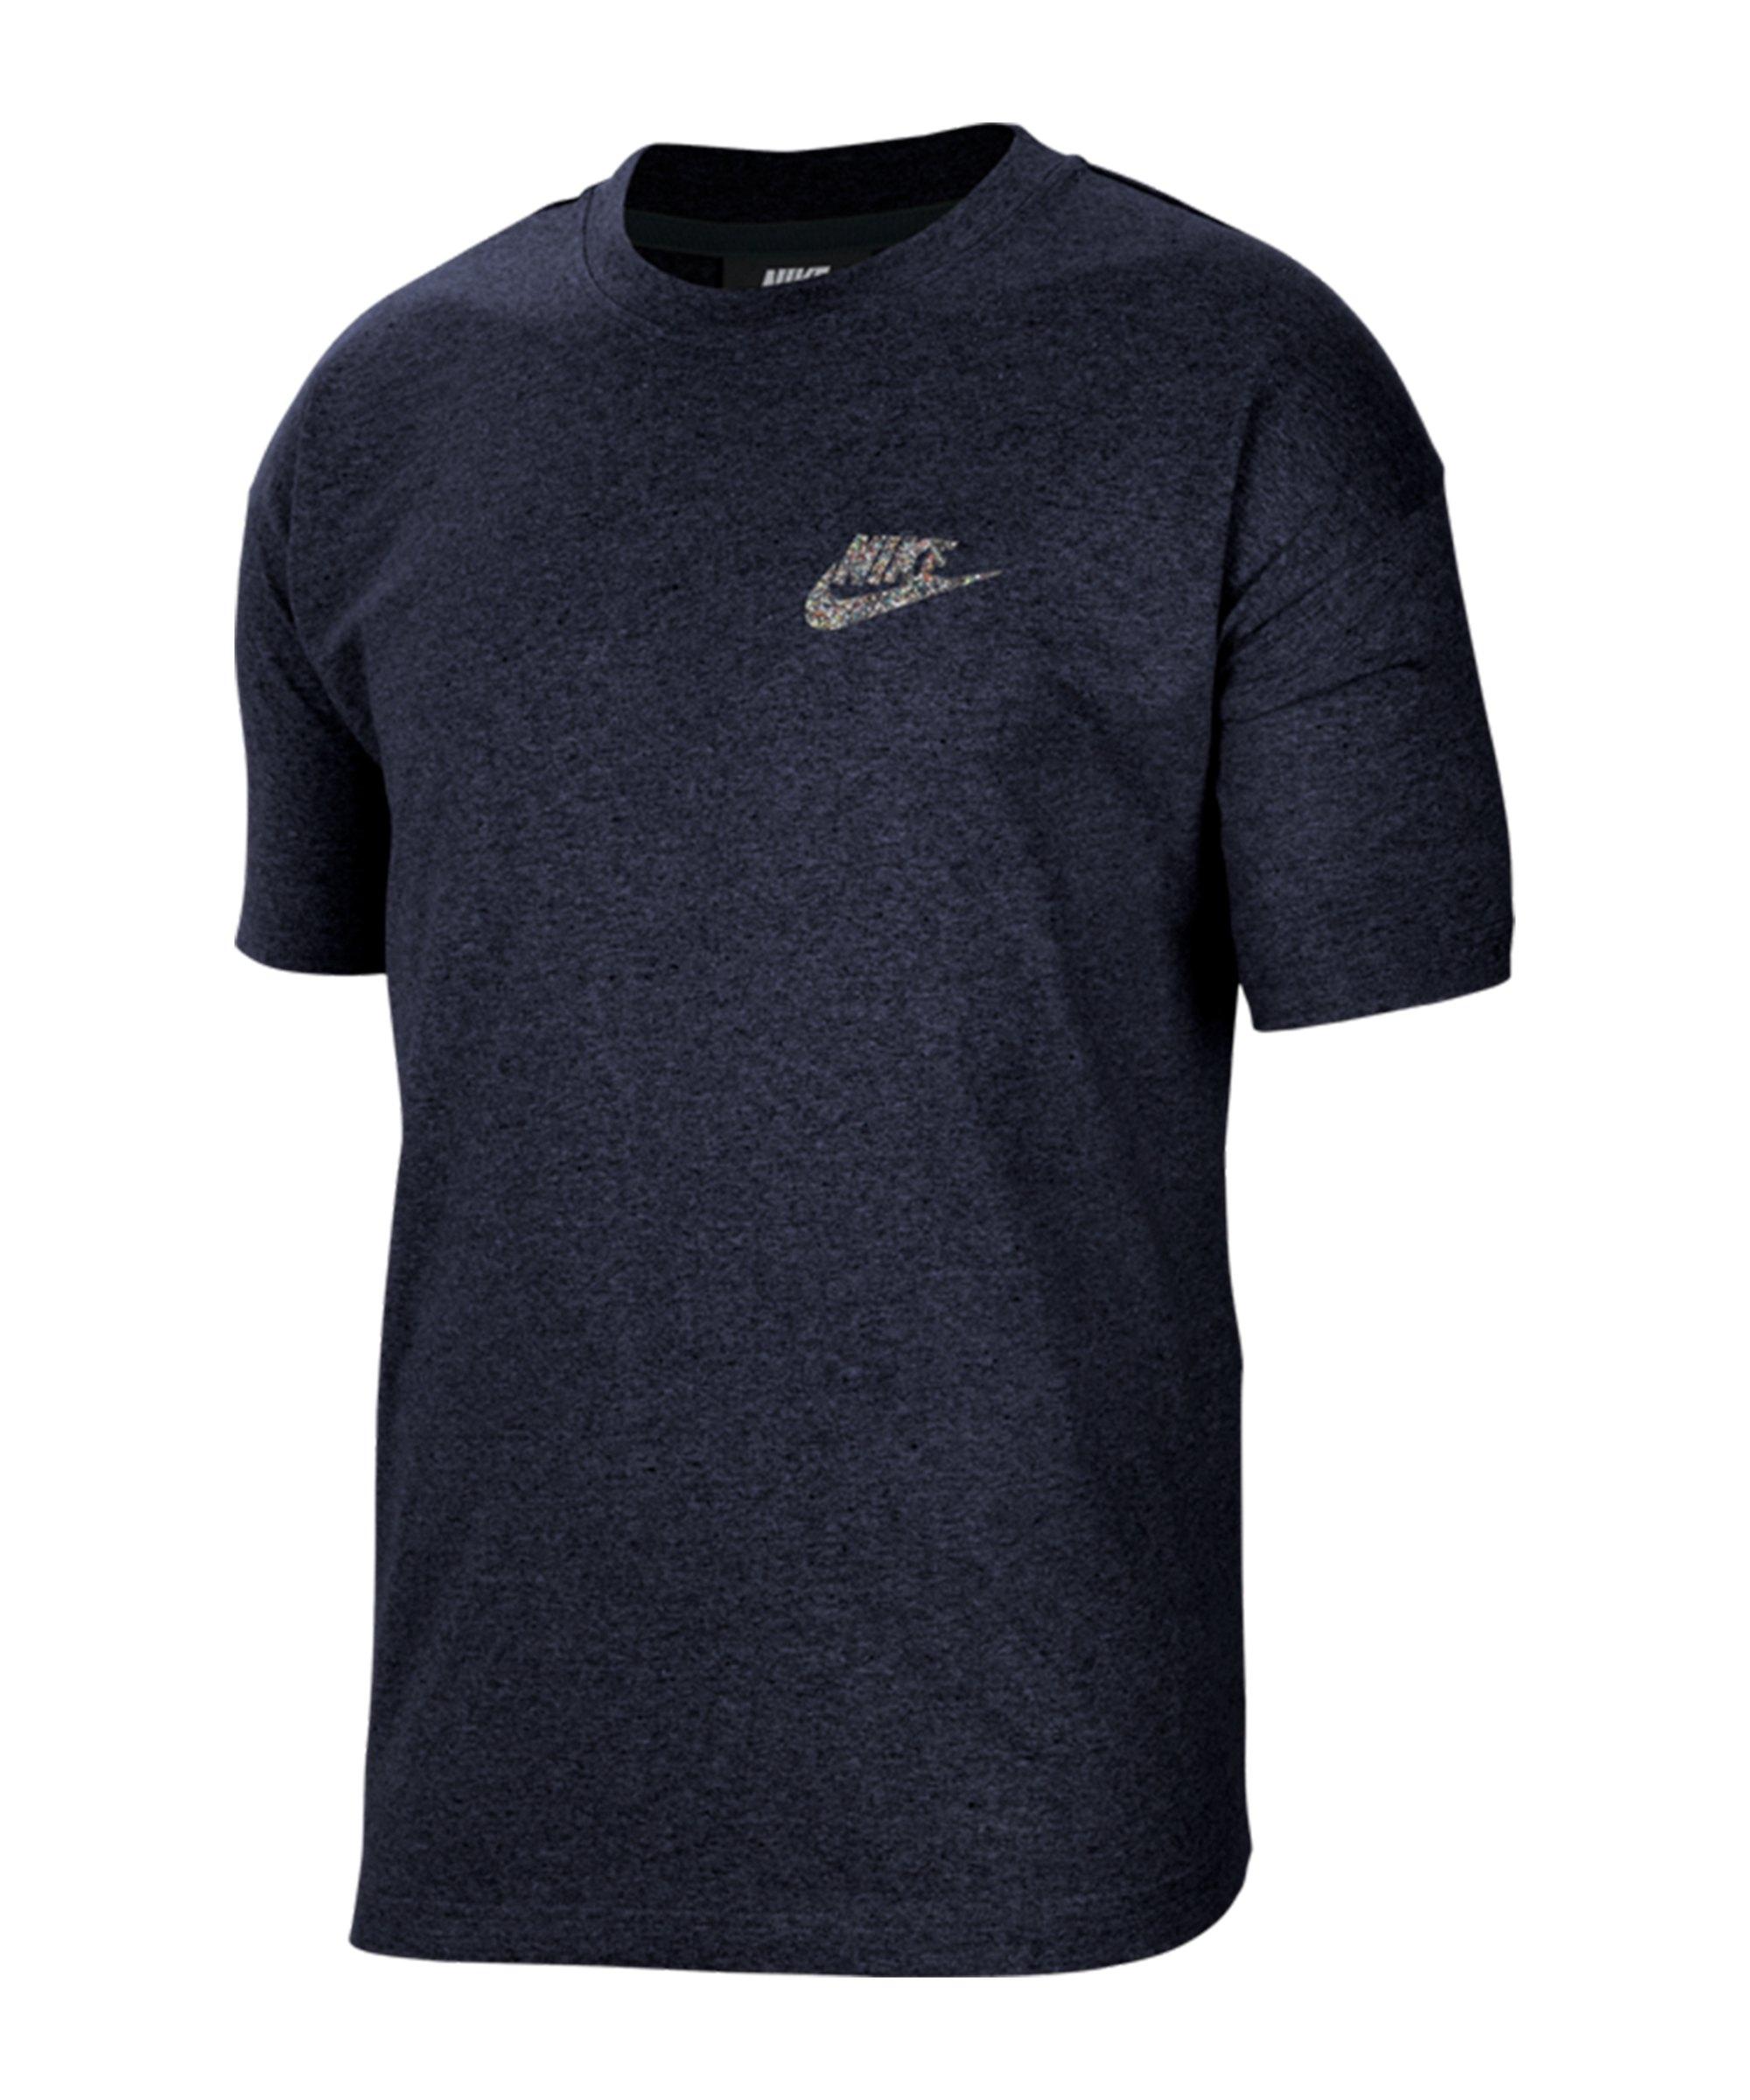 Nike Essentials T-Shirt Blau F905 - blau